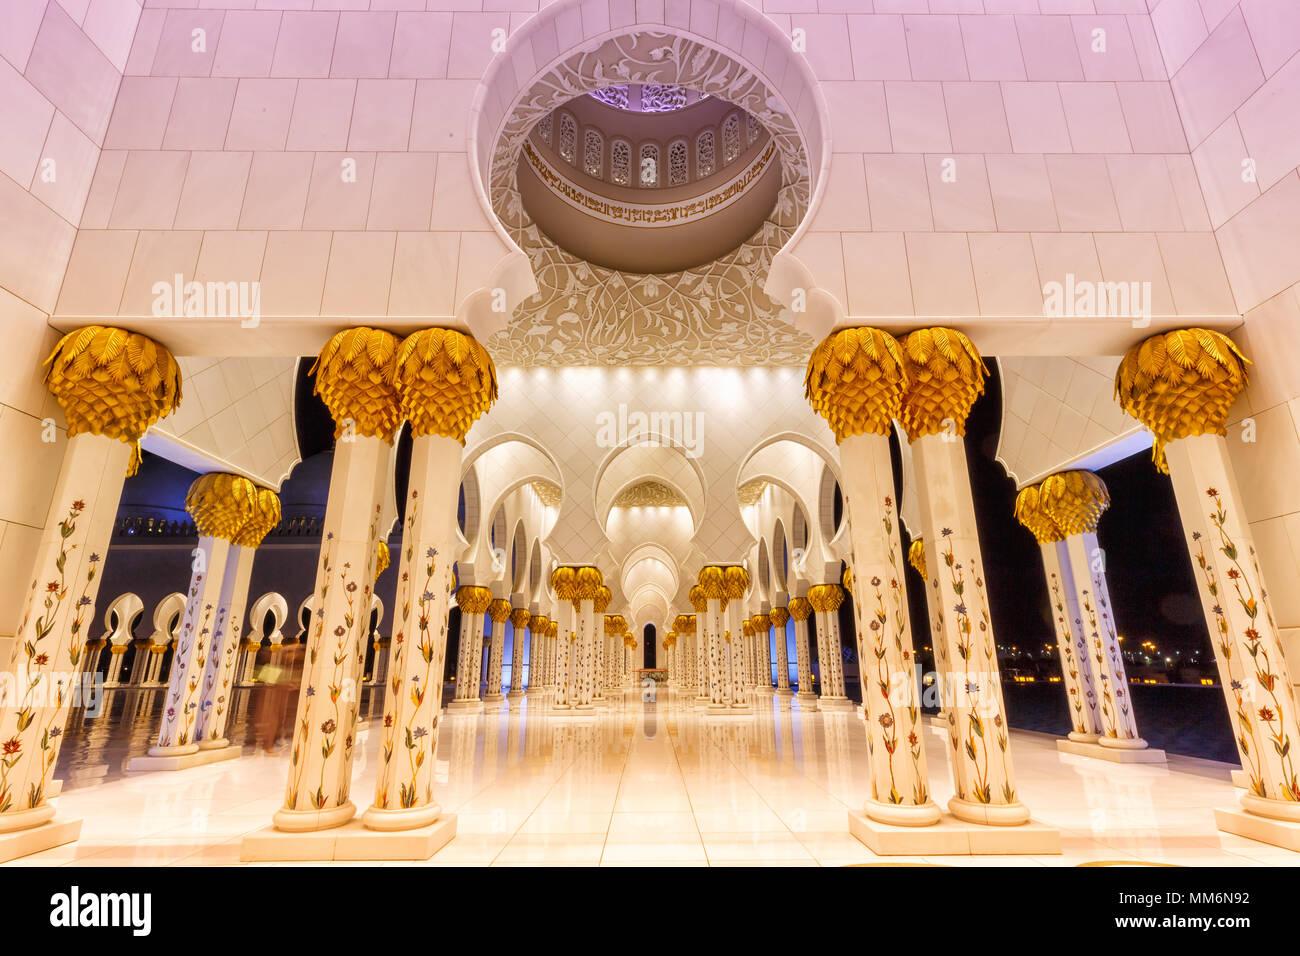 Gran Mezquita de Sheikh Zayed en Abu Dhabi, Emiratos Arabes Unidos UAE columnas Imagen De Stock